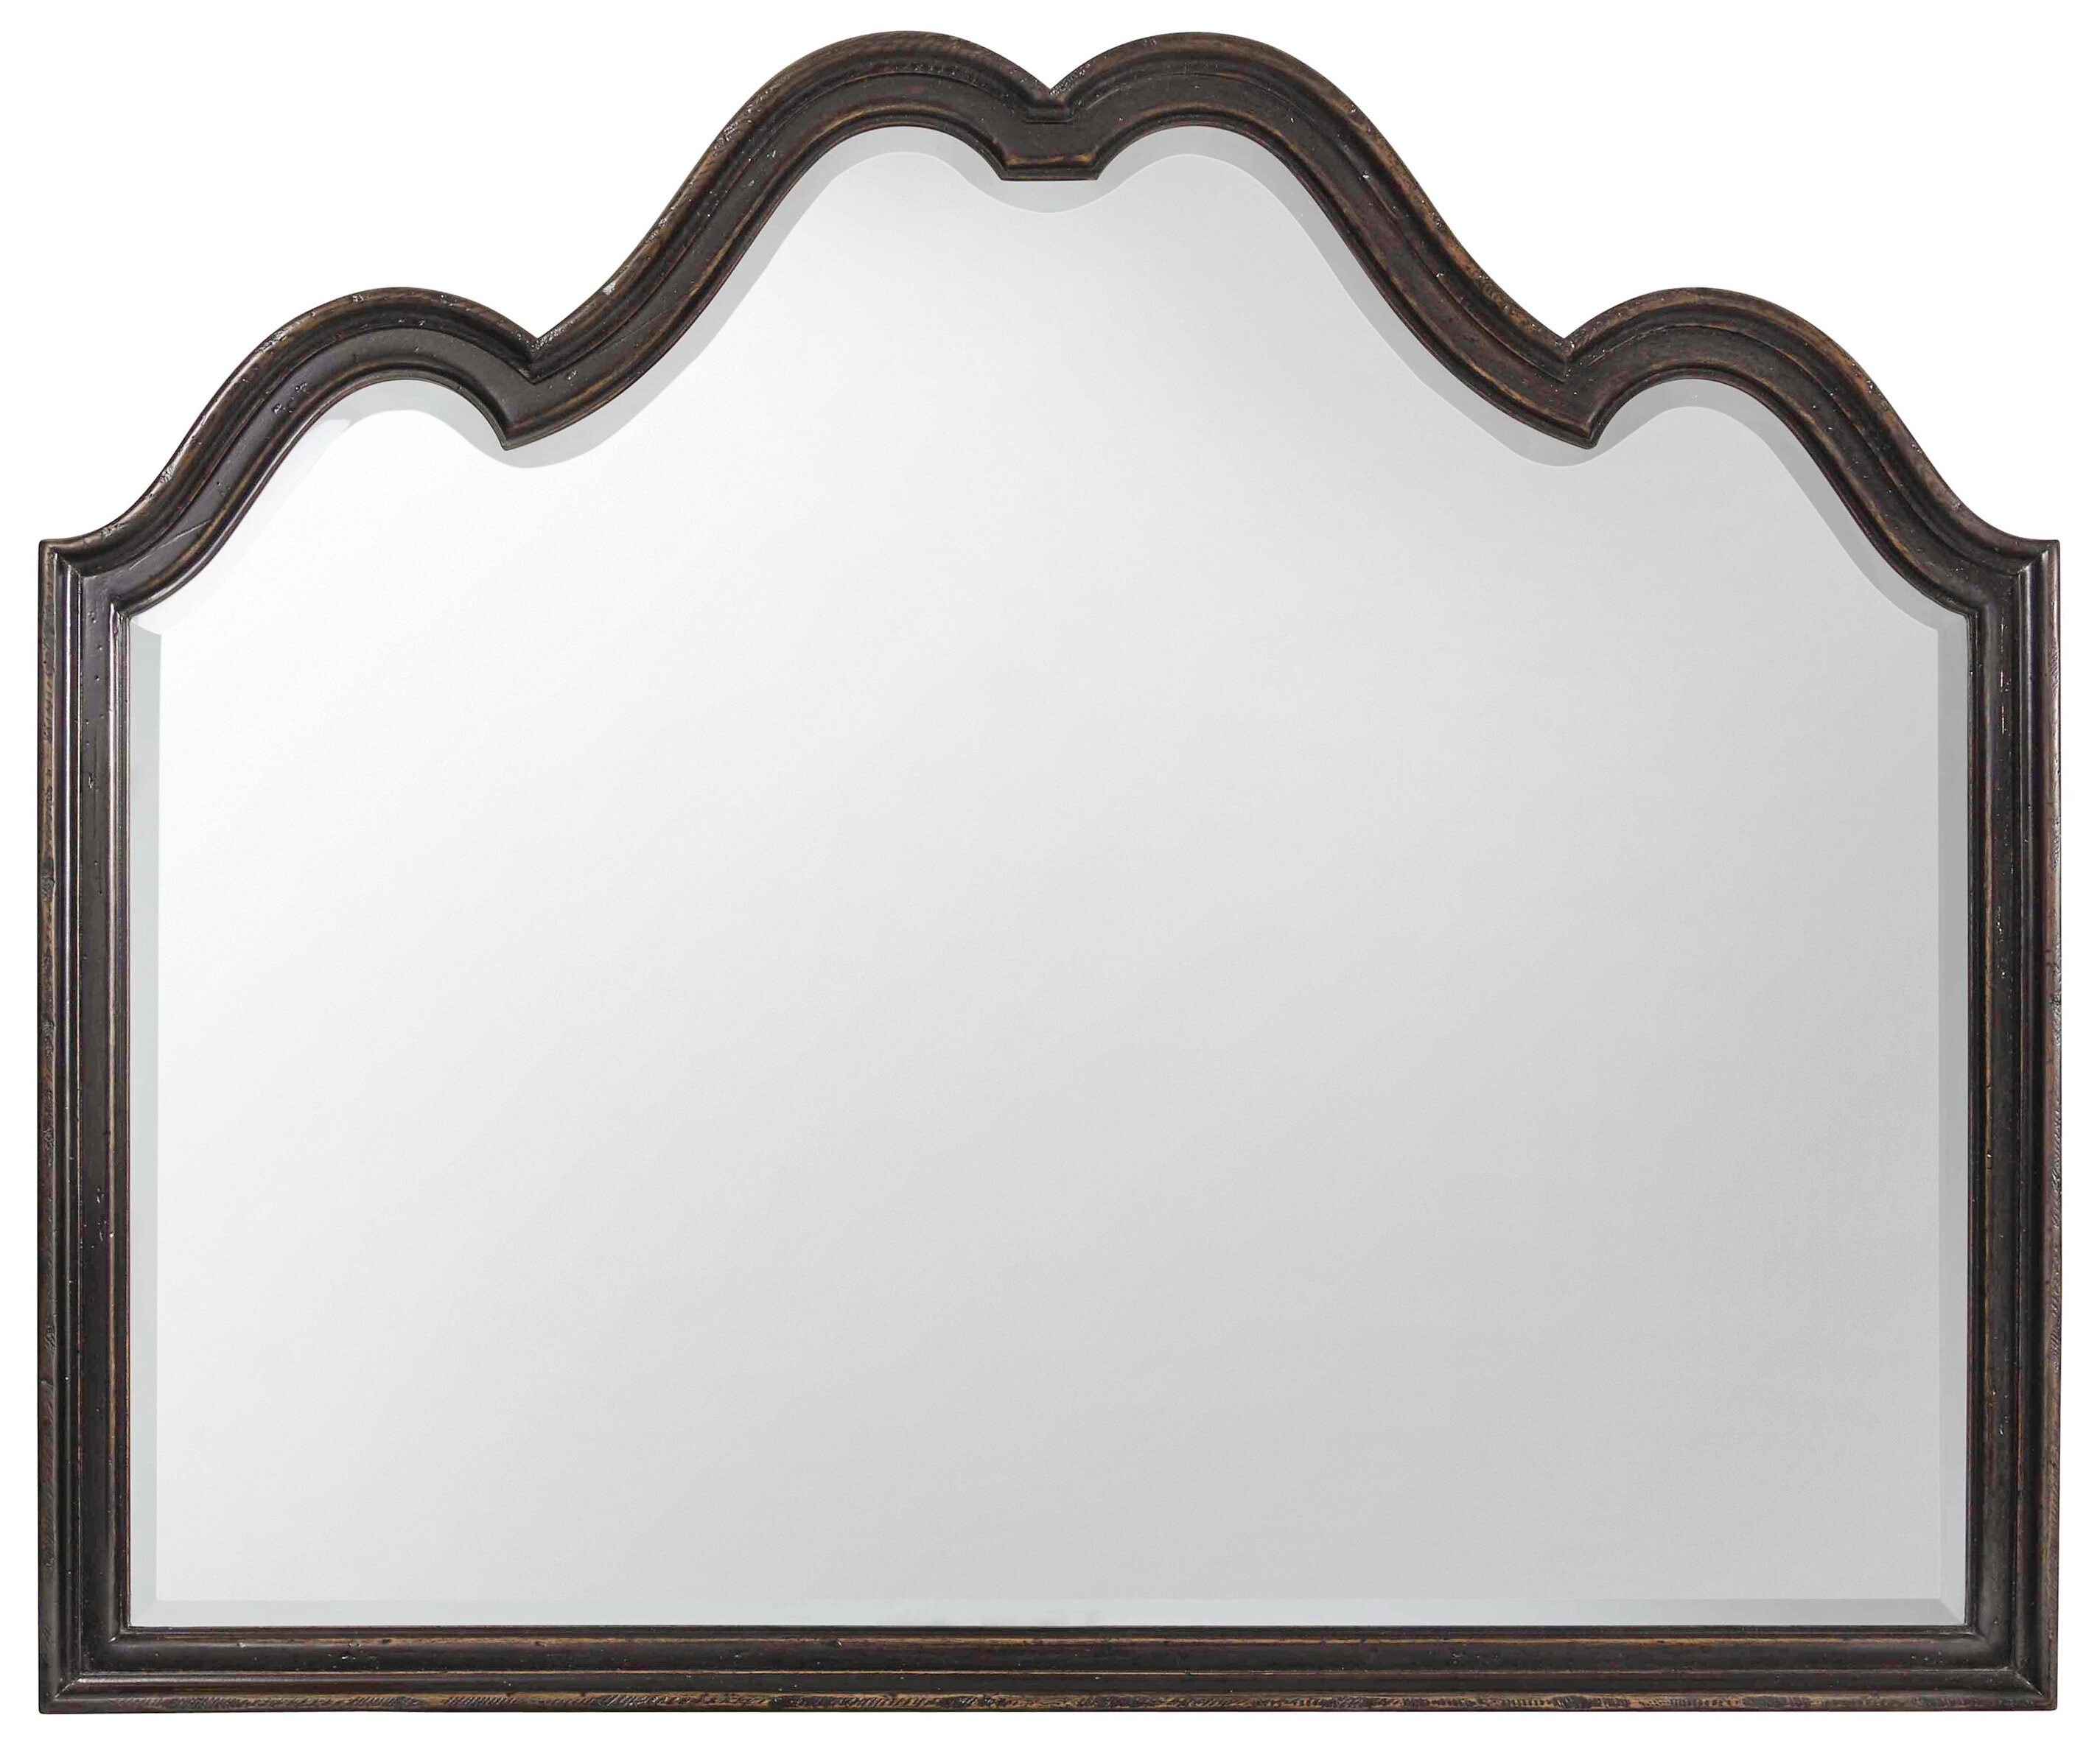 Dresser Mirror Hooker Furniture Mirrors You Ll Love In 2021 Wayfair